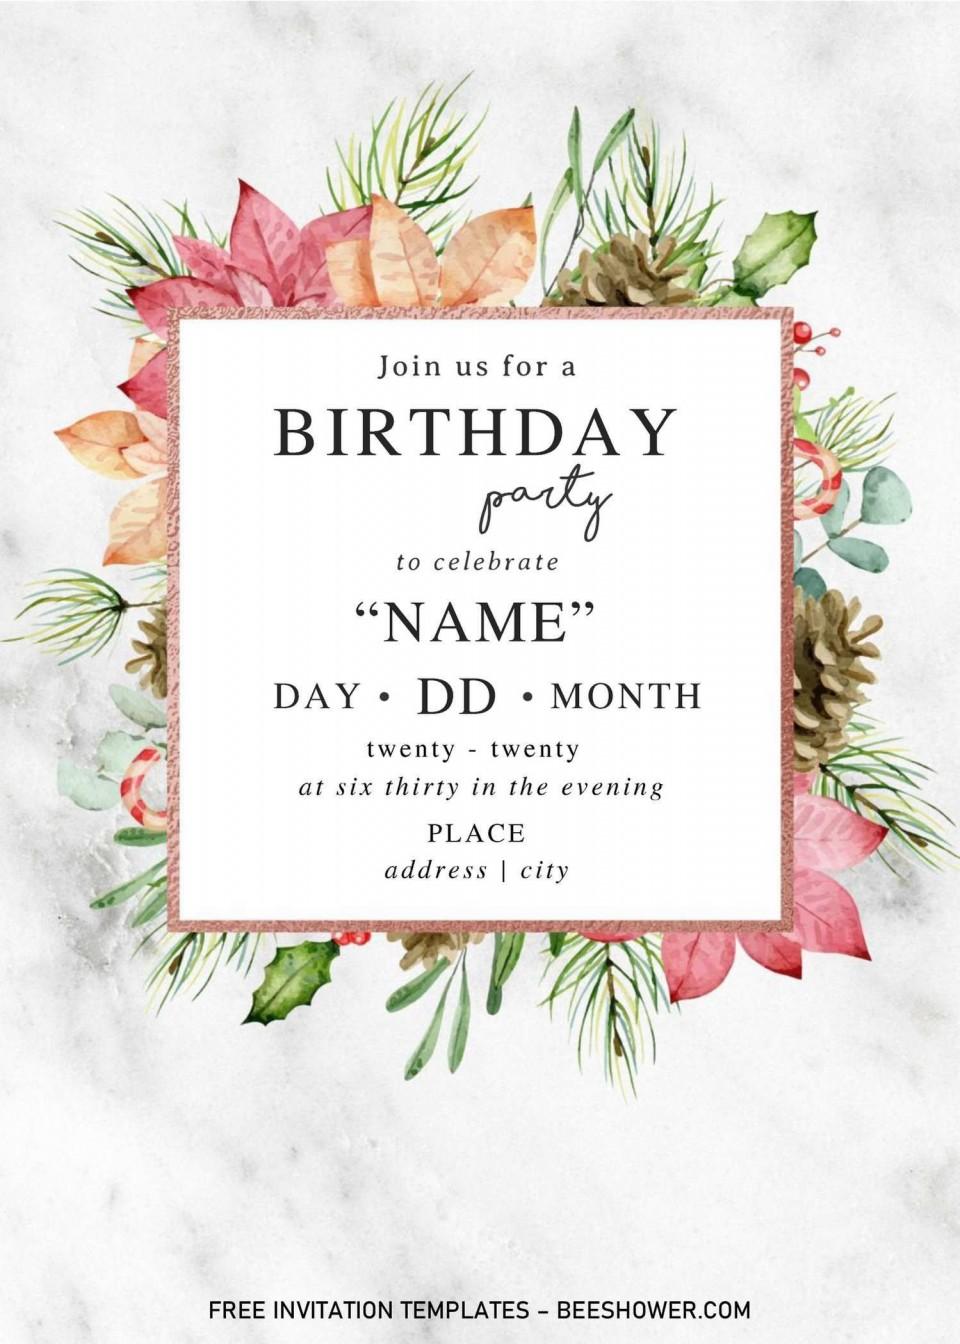 007 Striking Microsoft Word Invitation Template Baby Shower Picture  M Invite Free960